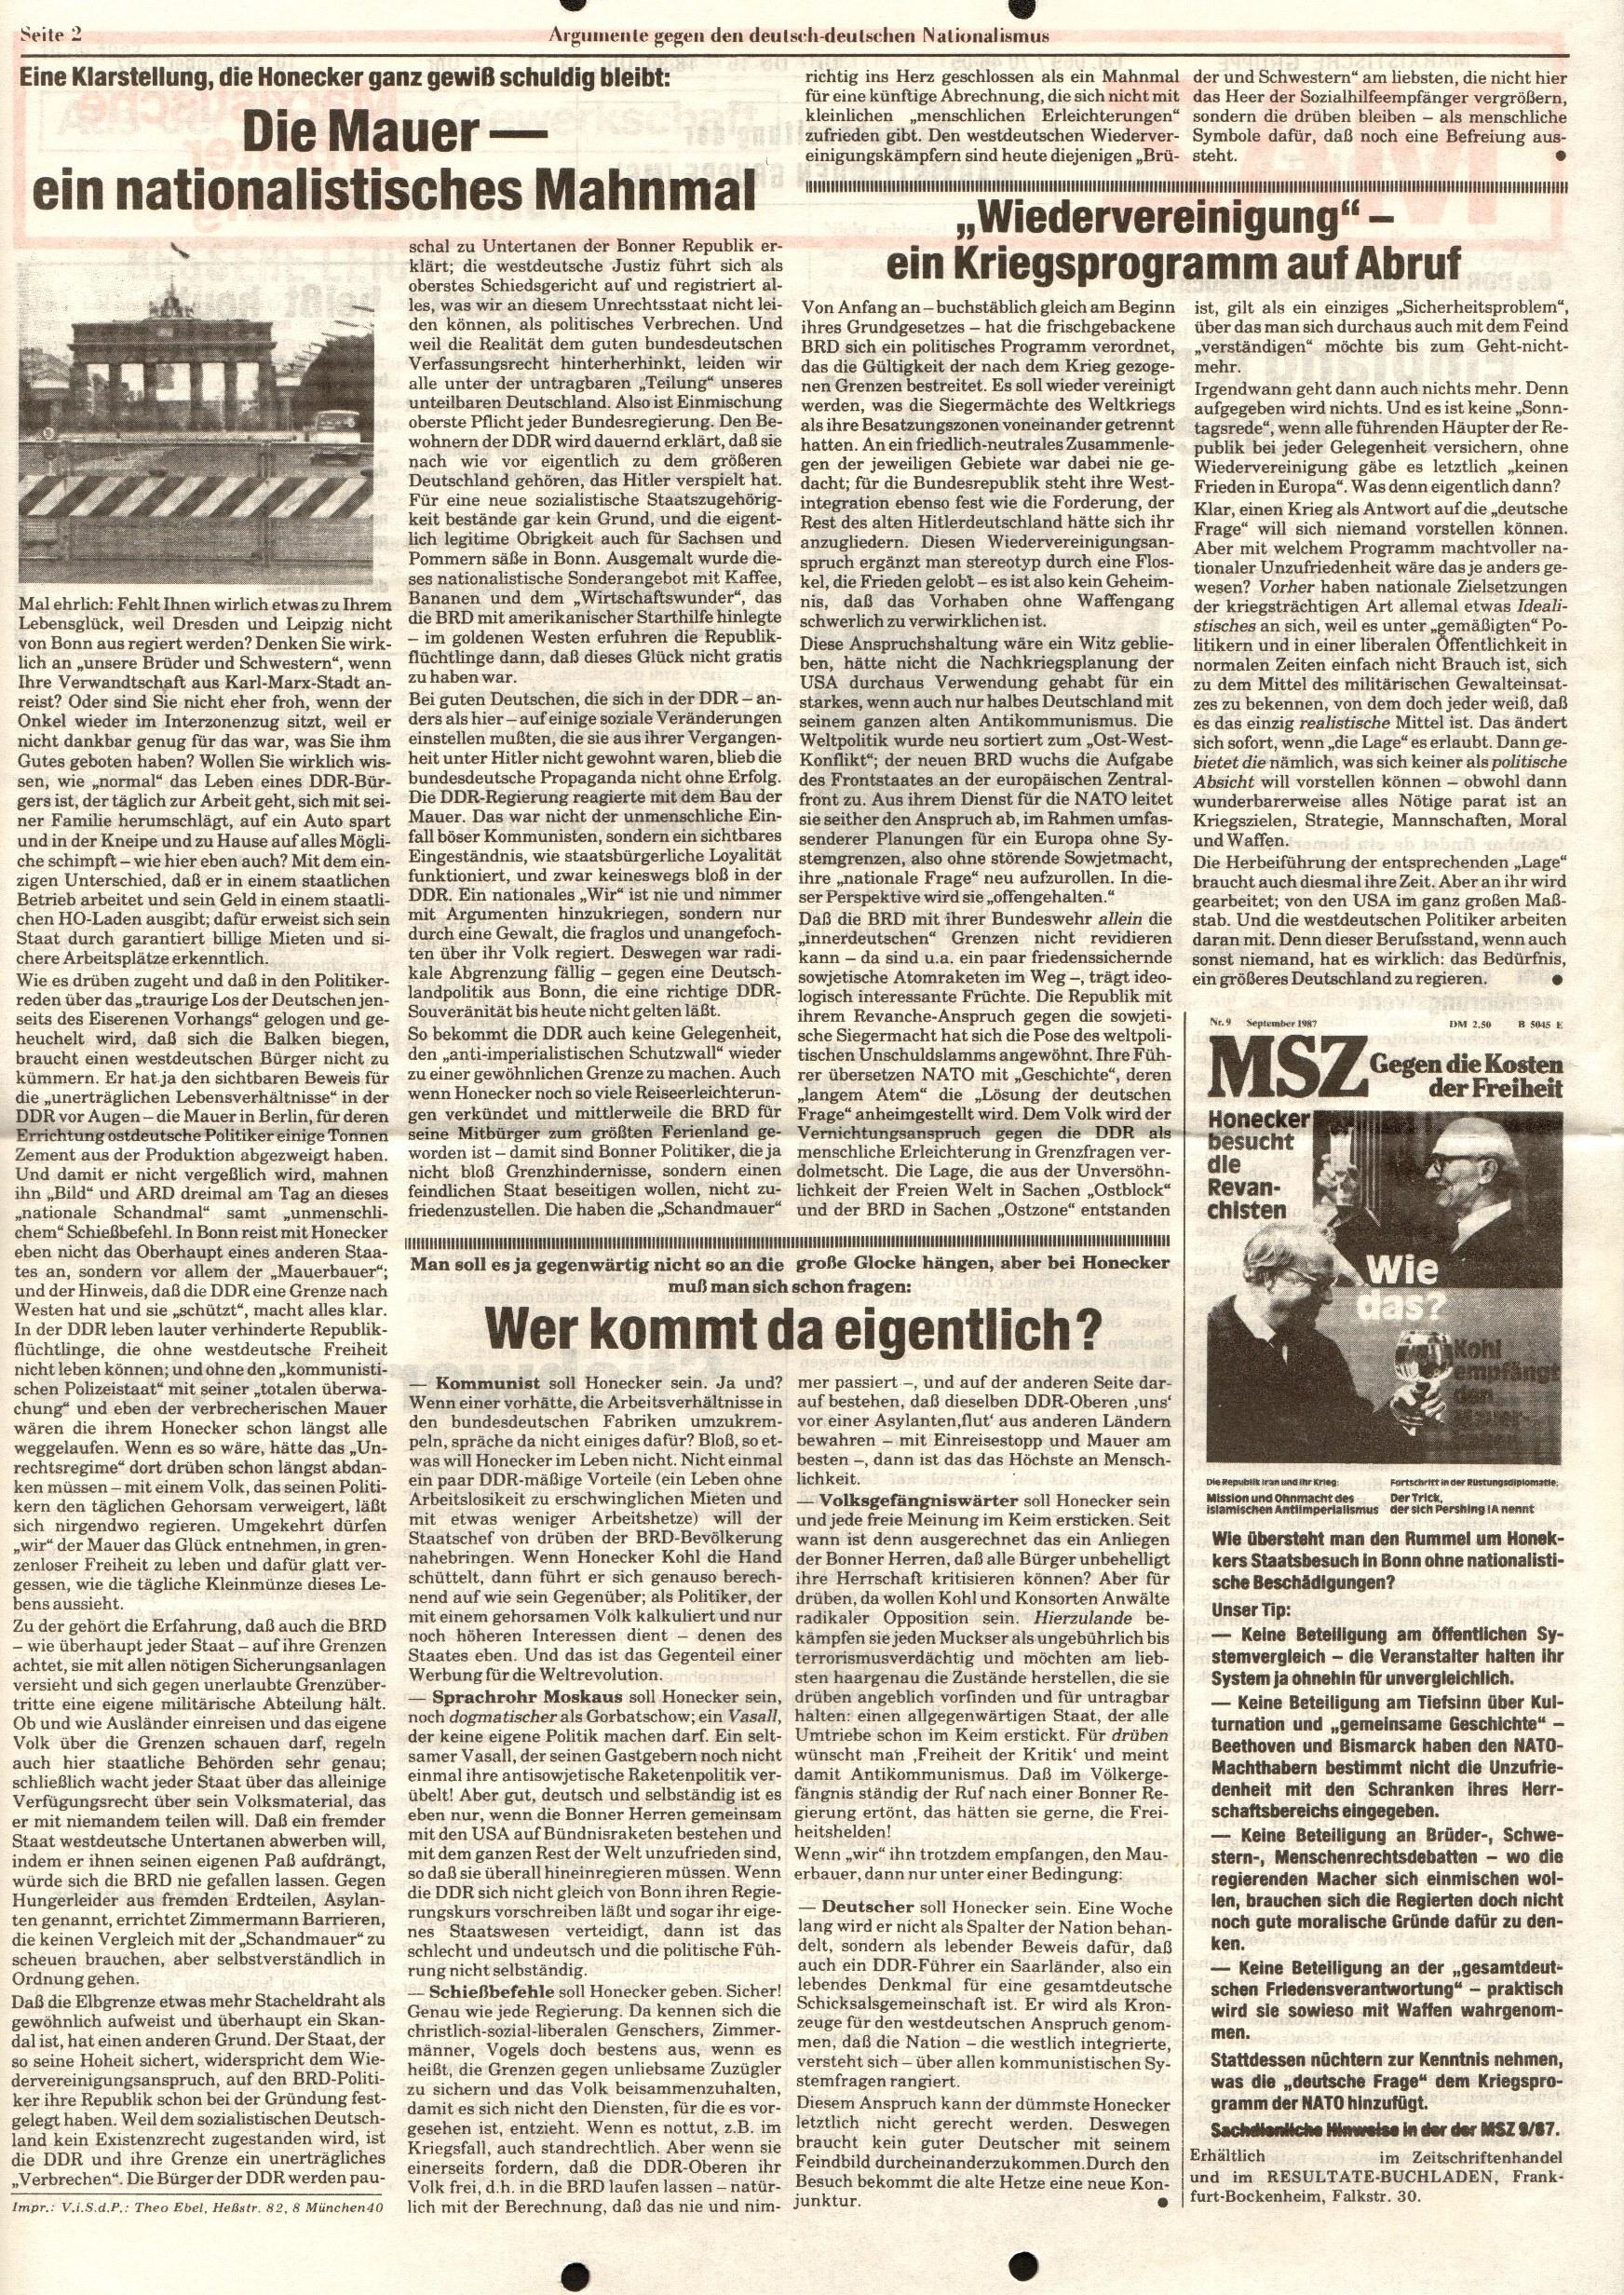 Frankfurt_CPK_Hoechst_MAZ462